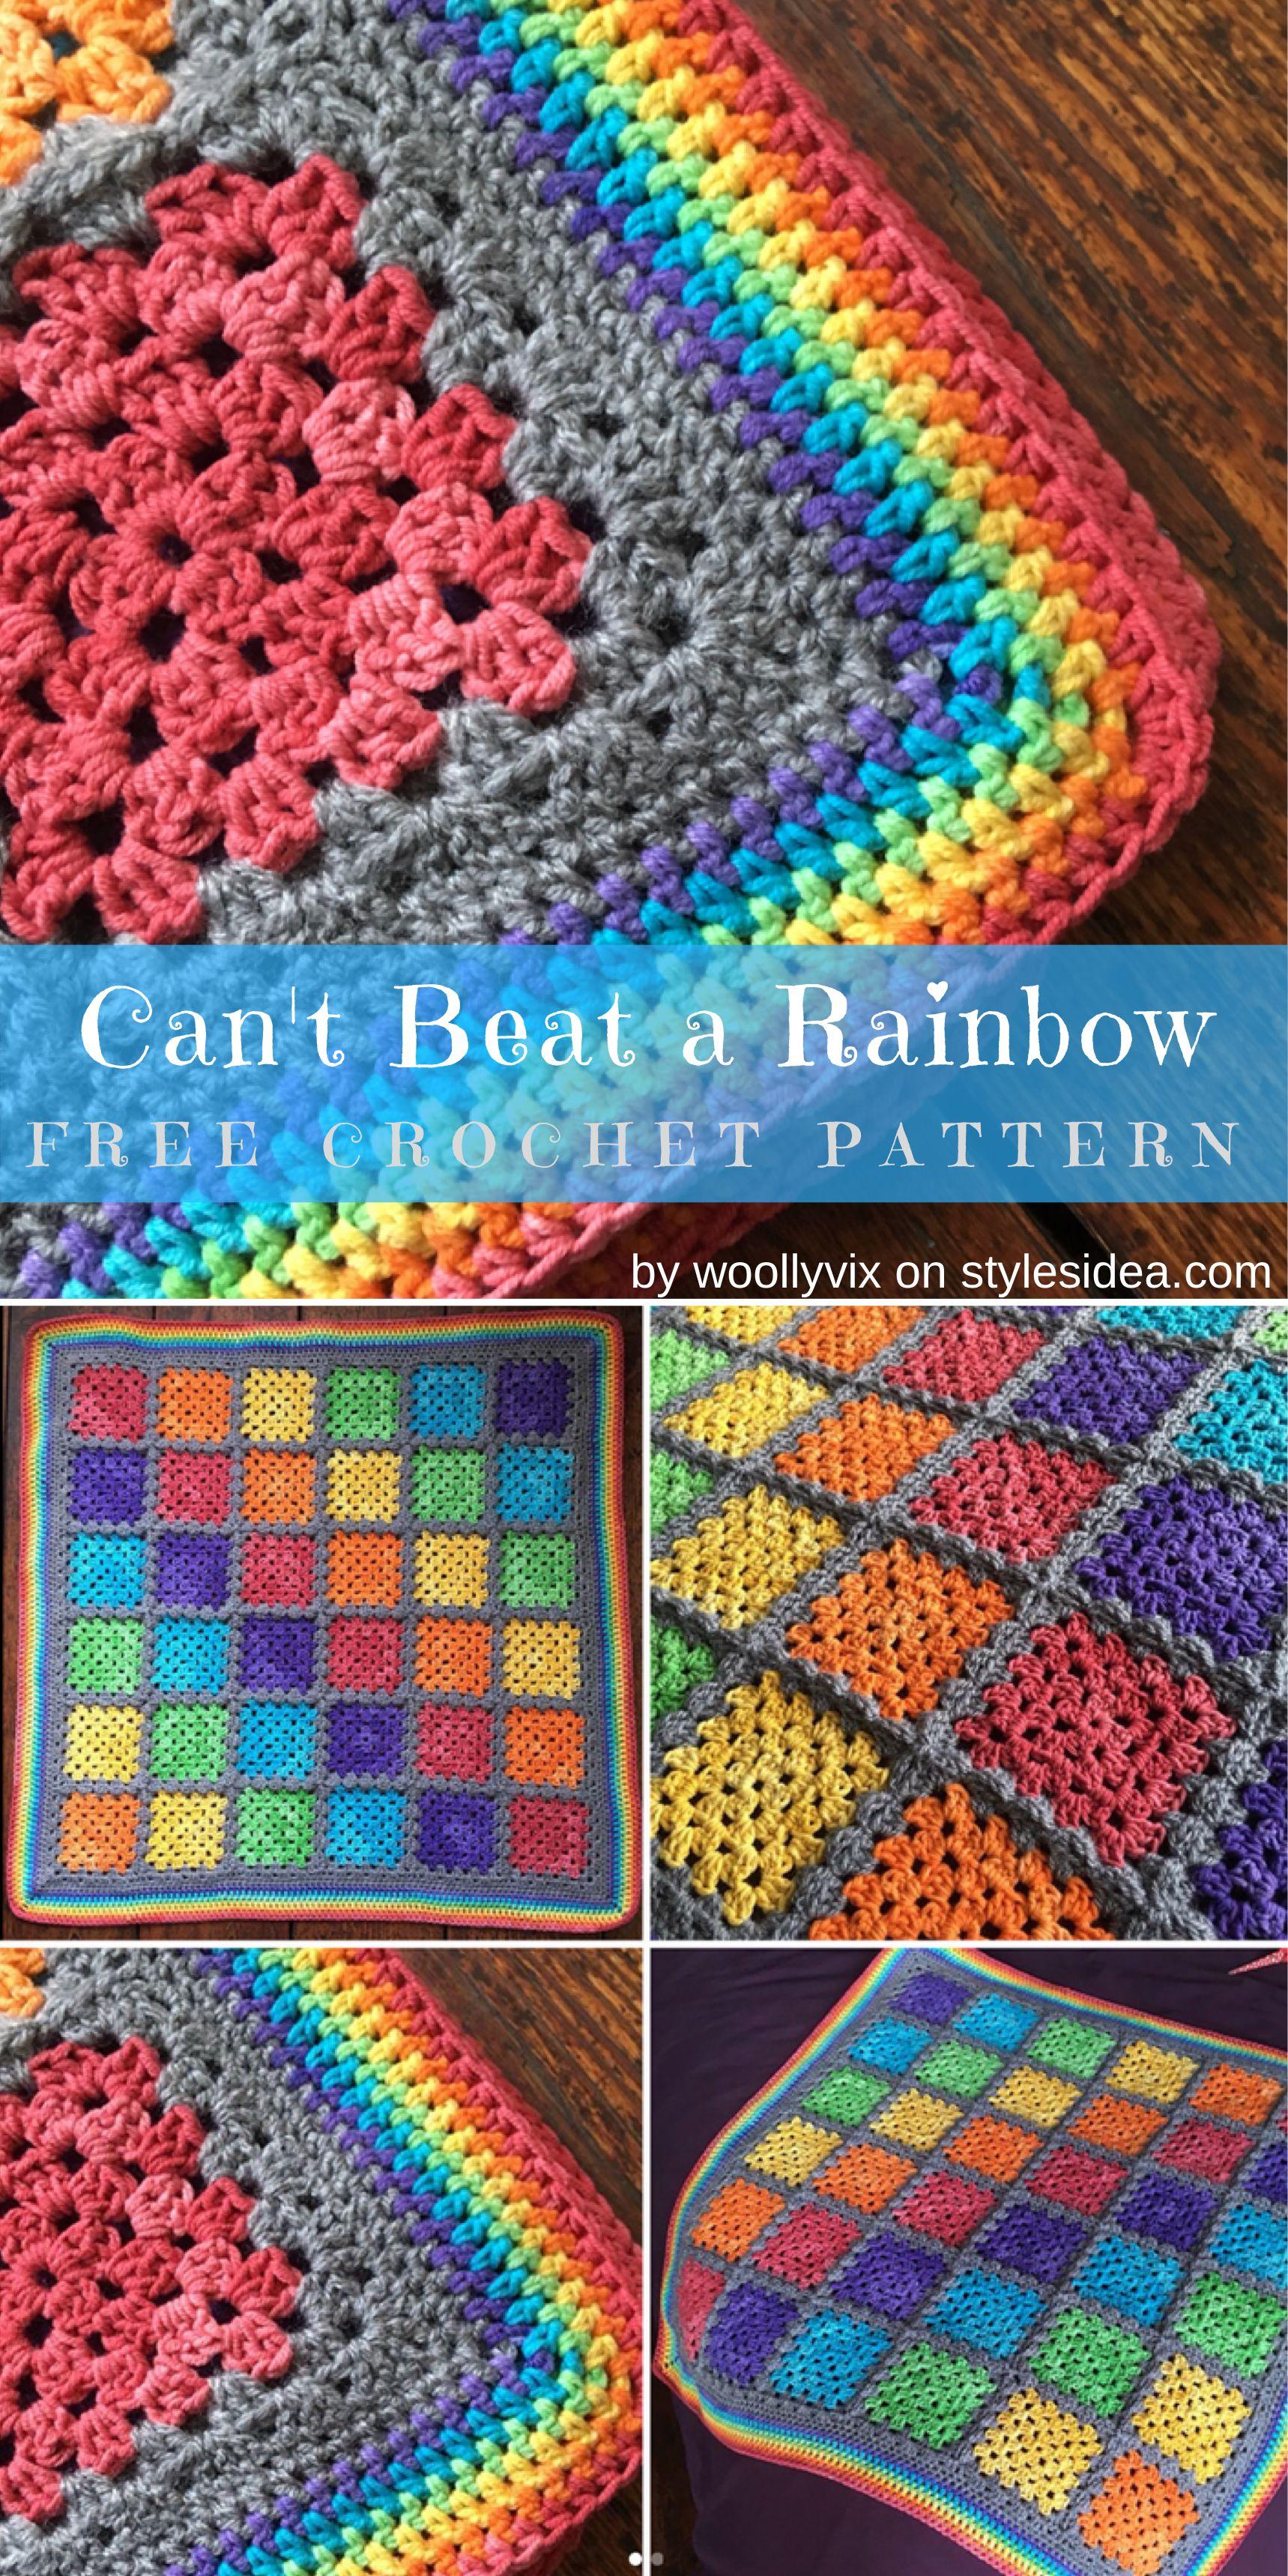 Rainbow Granny Squares Free Crochet Pattern | Häkeln, Feste masche ...